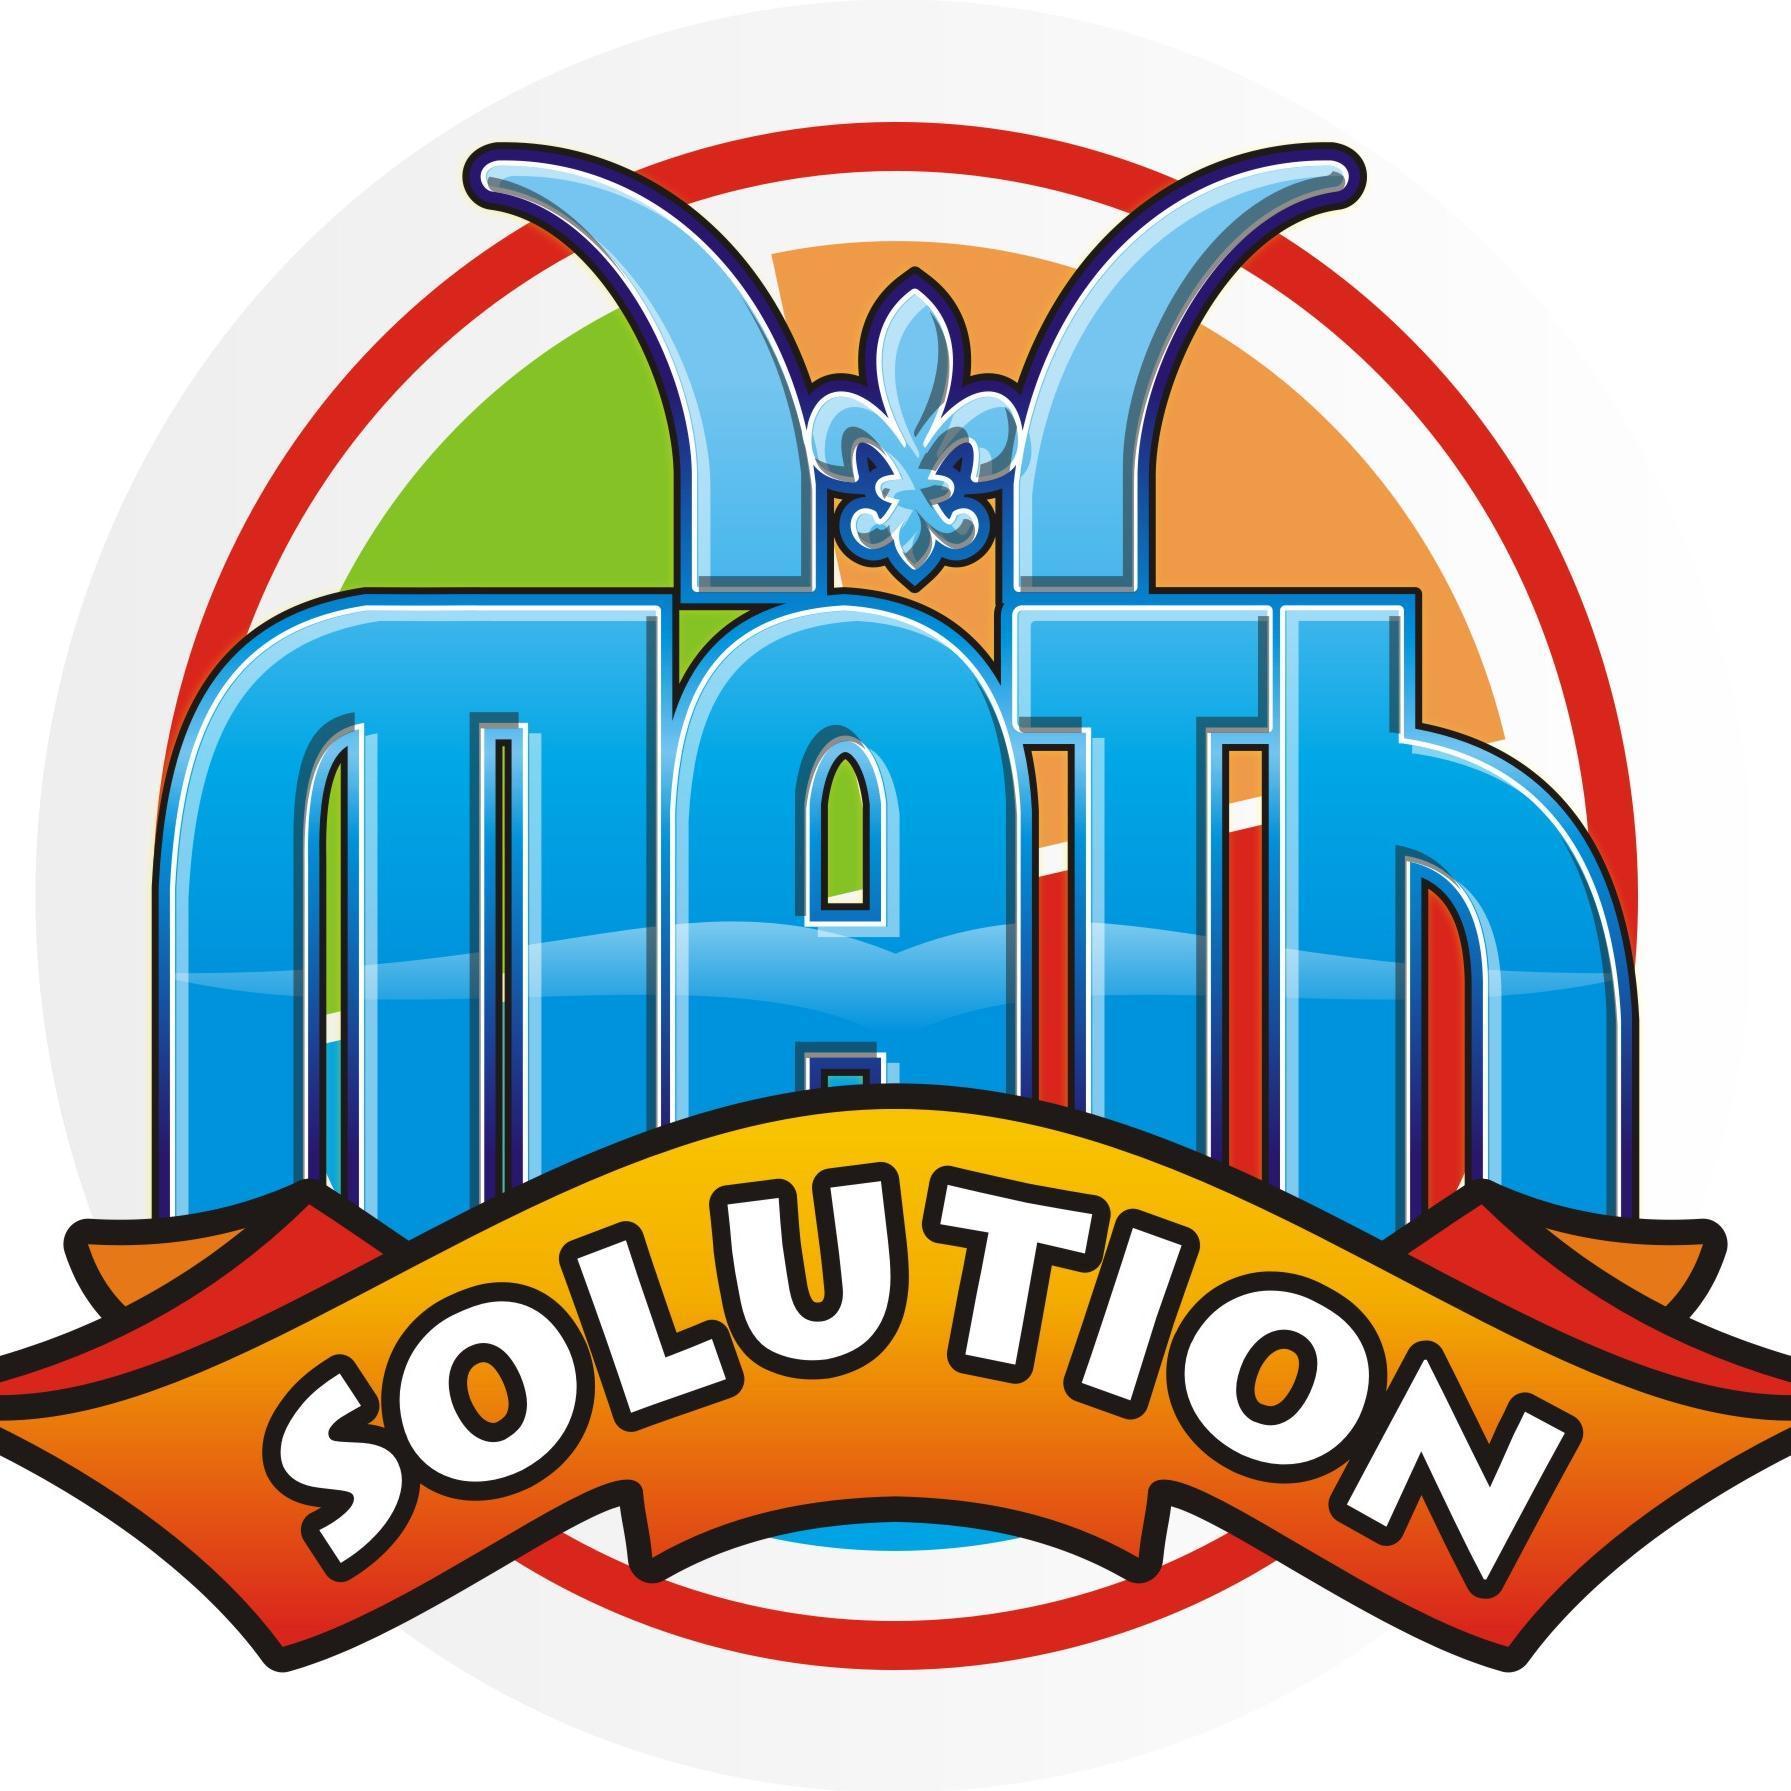 Fine Mathsolution Photos - Worksheet Math for Homework - kelrhas.info